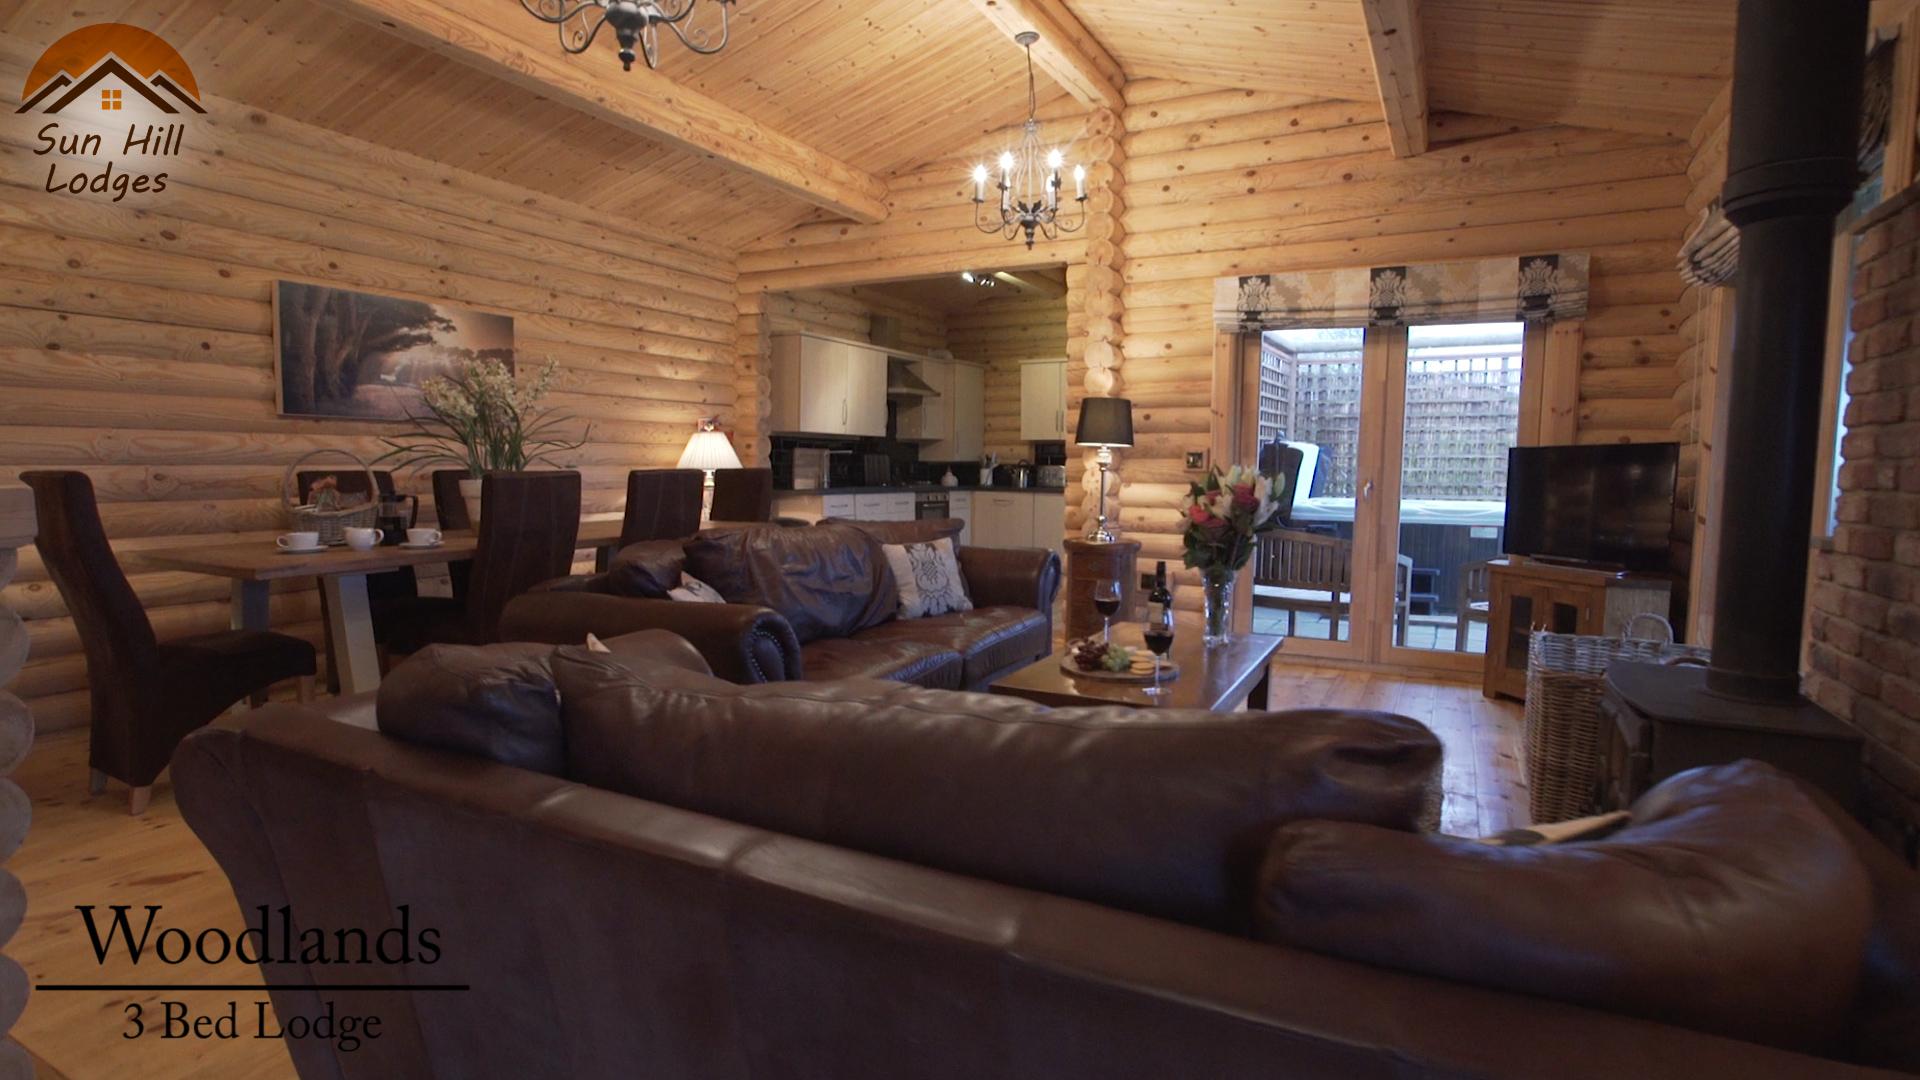 Lodge4_Sunhill.jpg